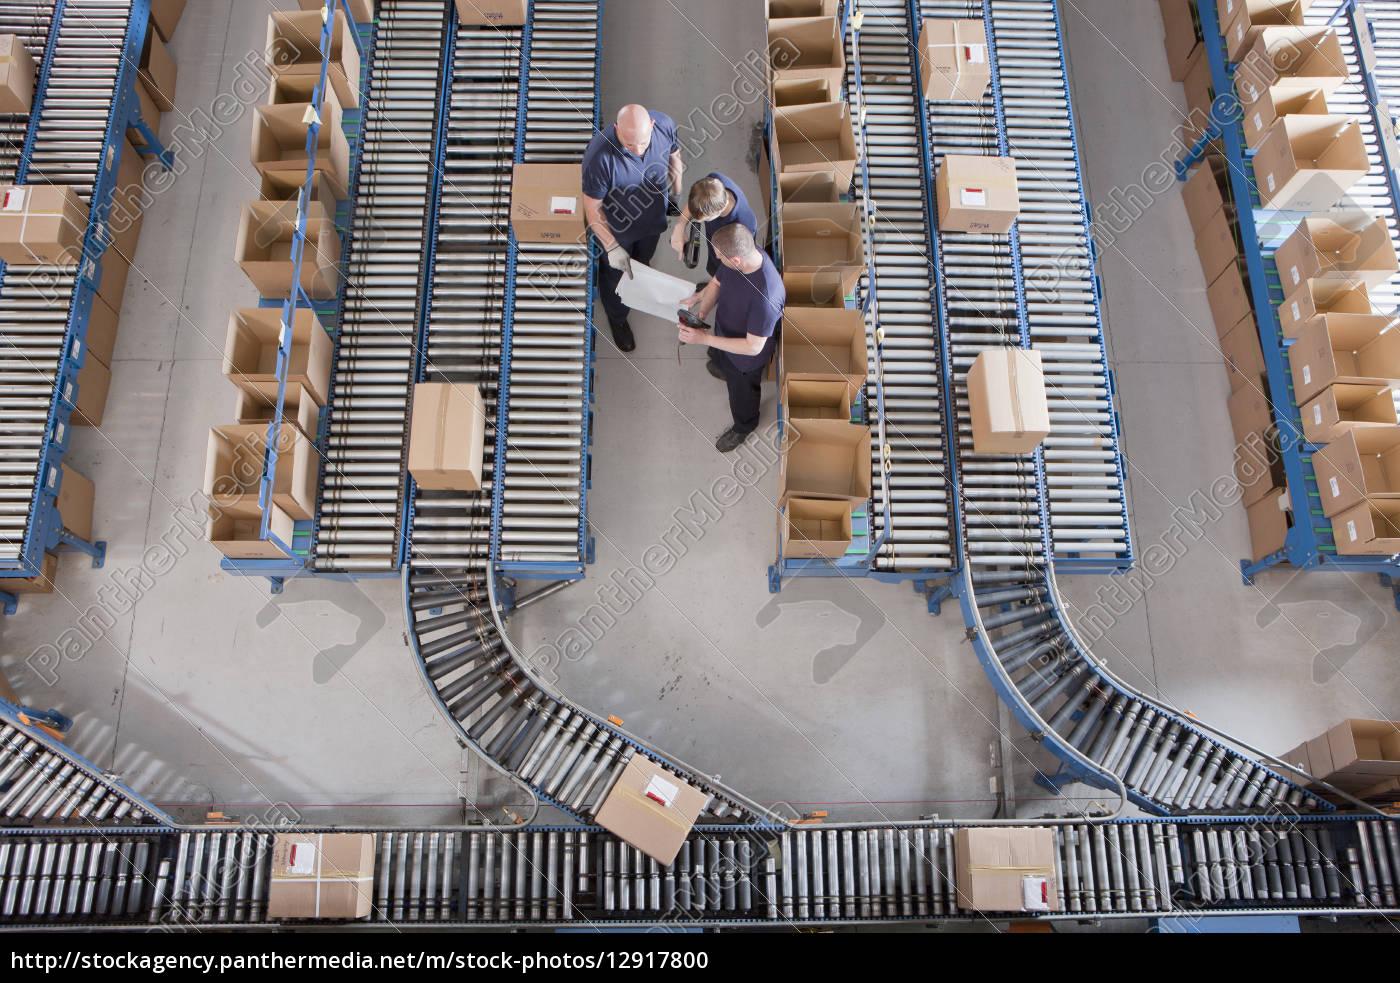 workers, meeting, among, boxes, on, conveyor - 12917800